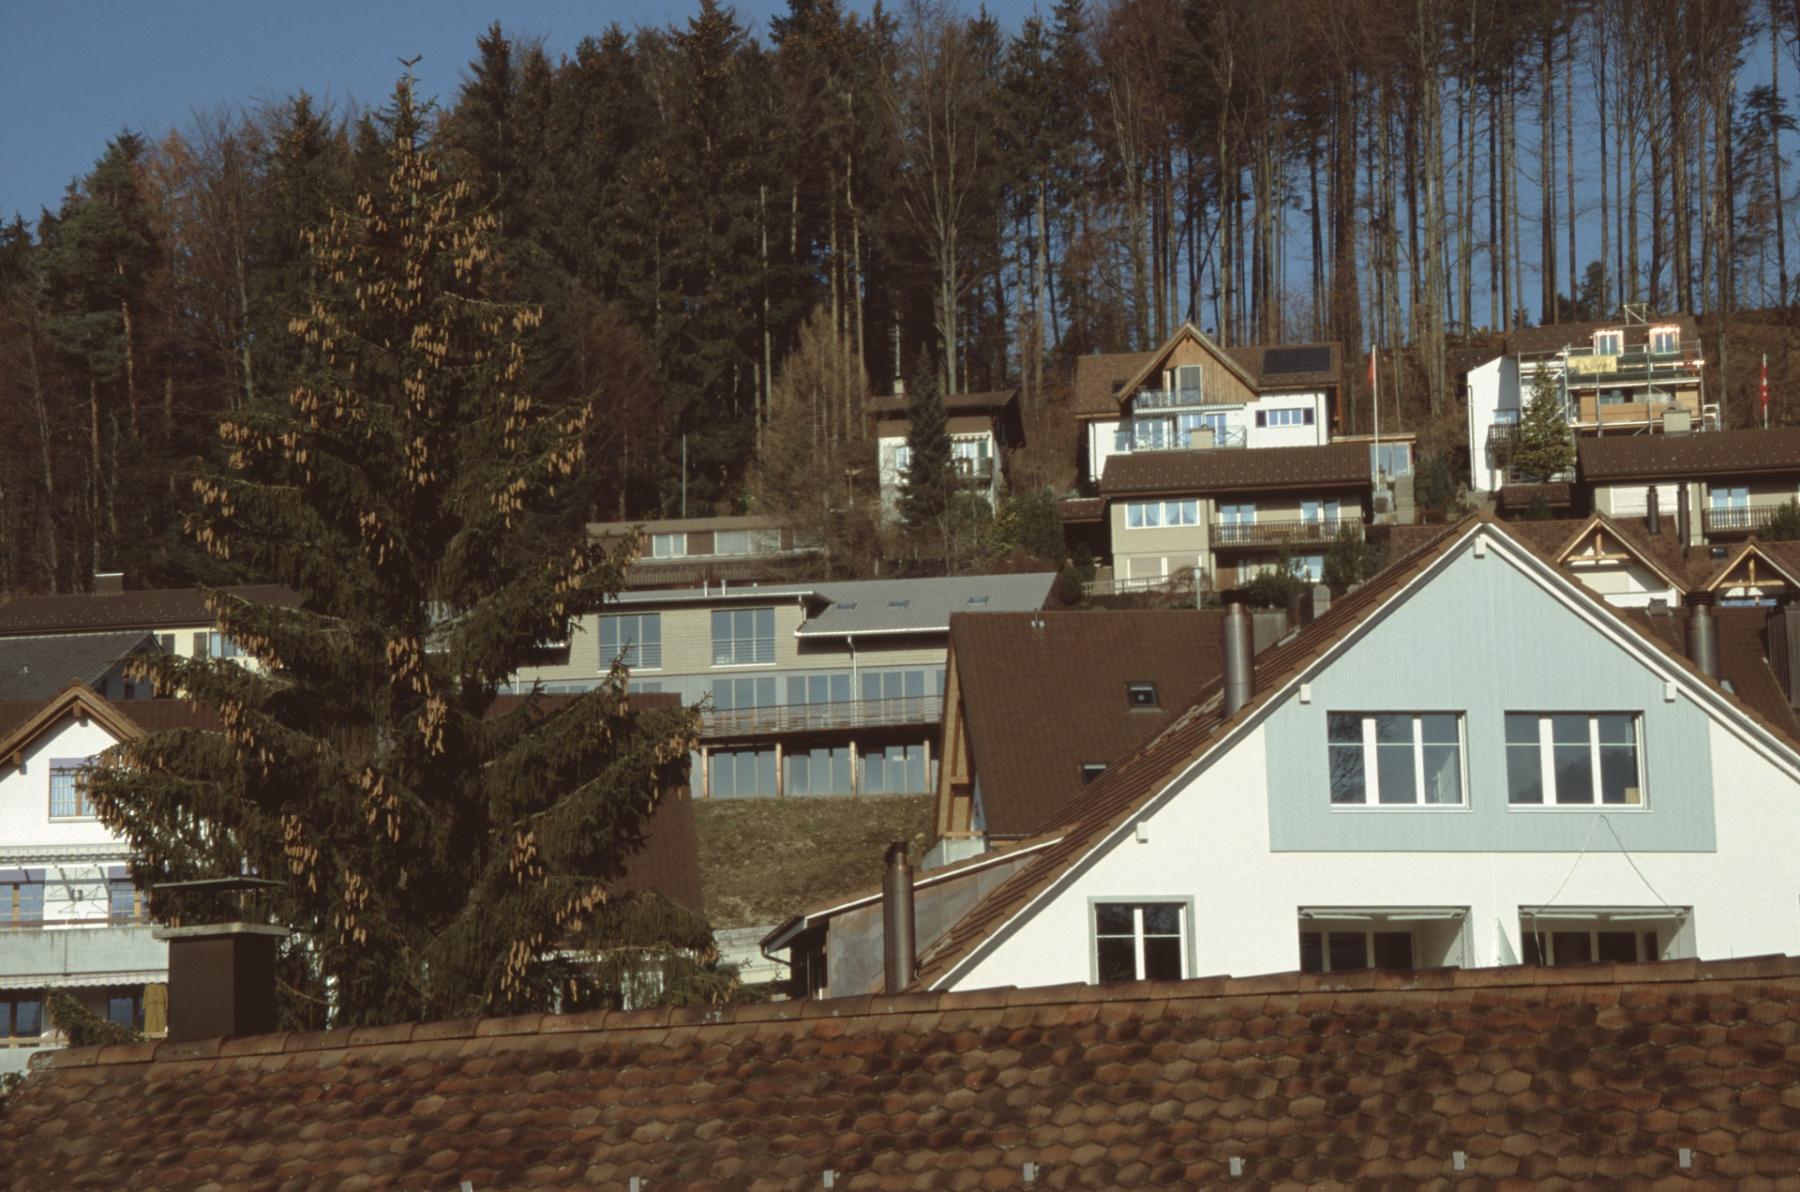 Lettenbergquartier (Grundstr, Lettenbergstr, Promnadenweg)